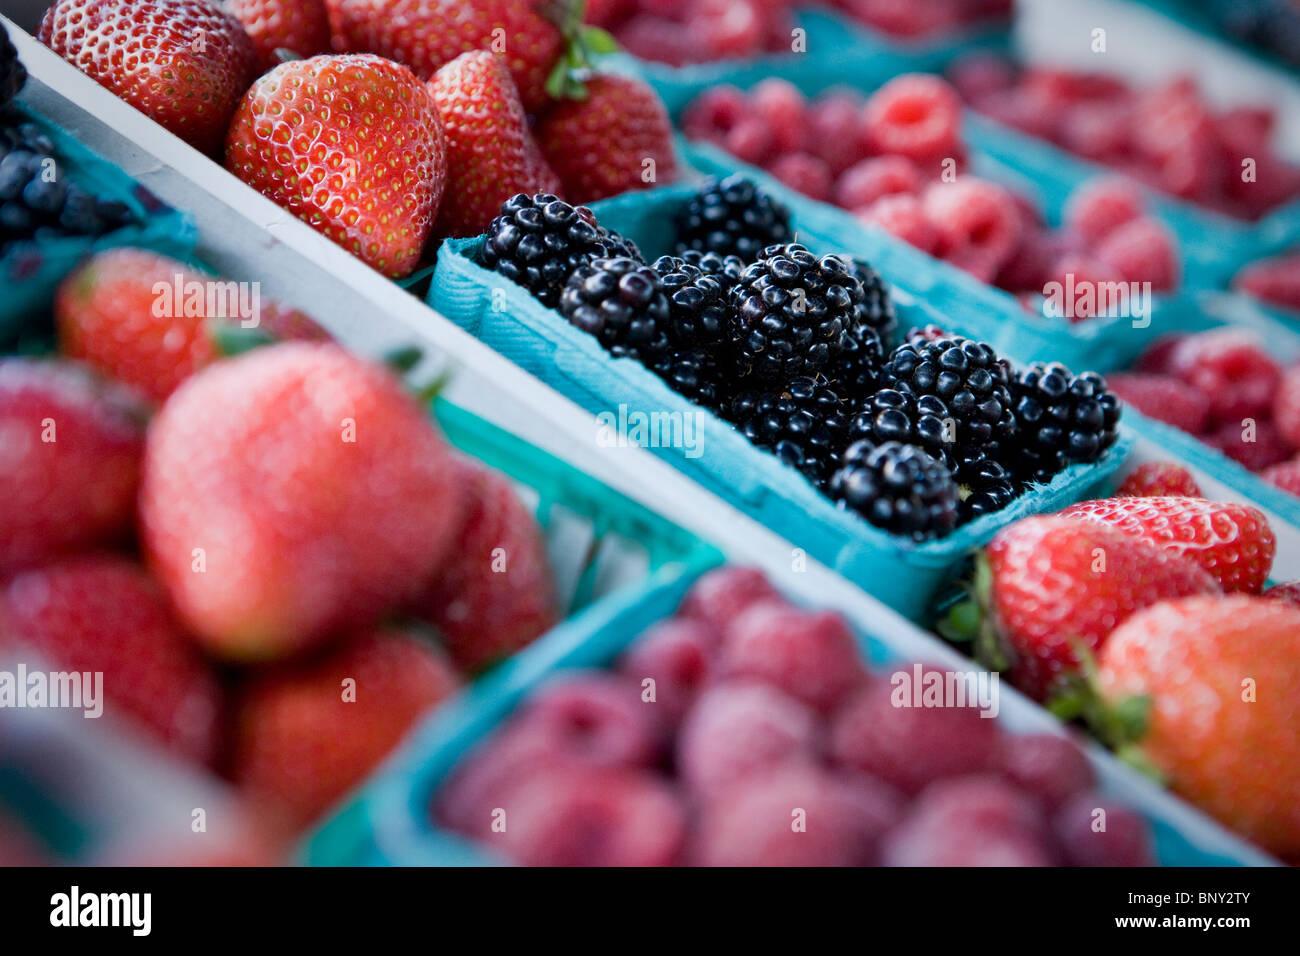 Baskets of berries at Farmer's Market, Santa Barbara, California - Stock Image